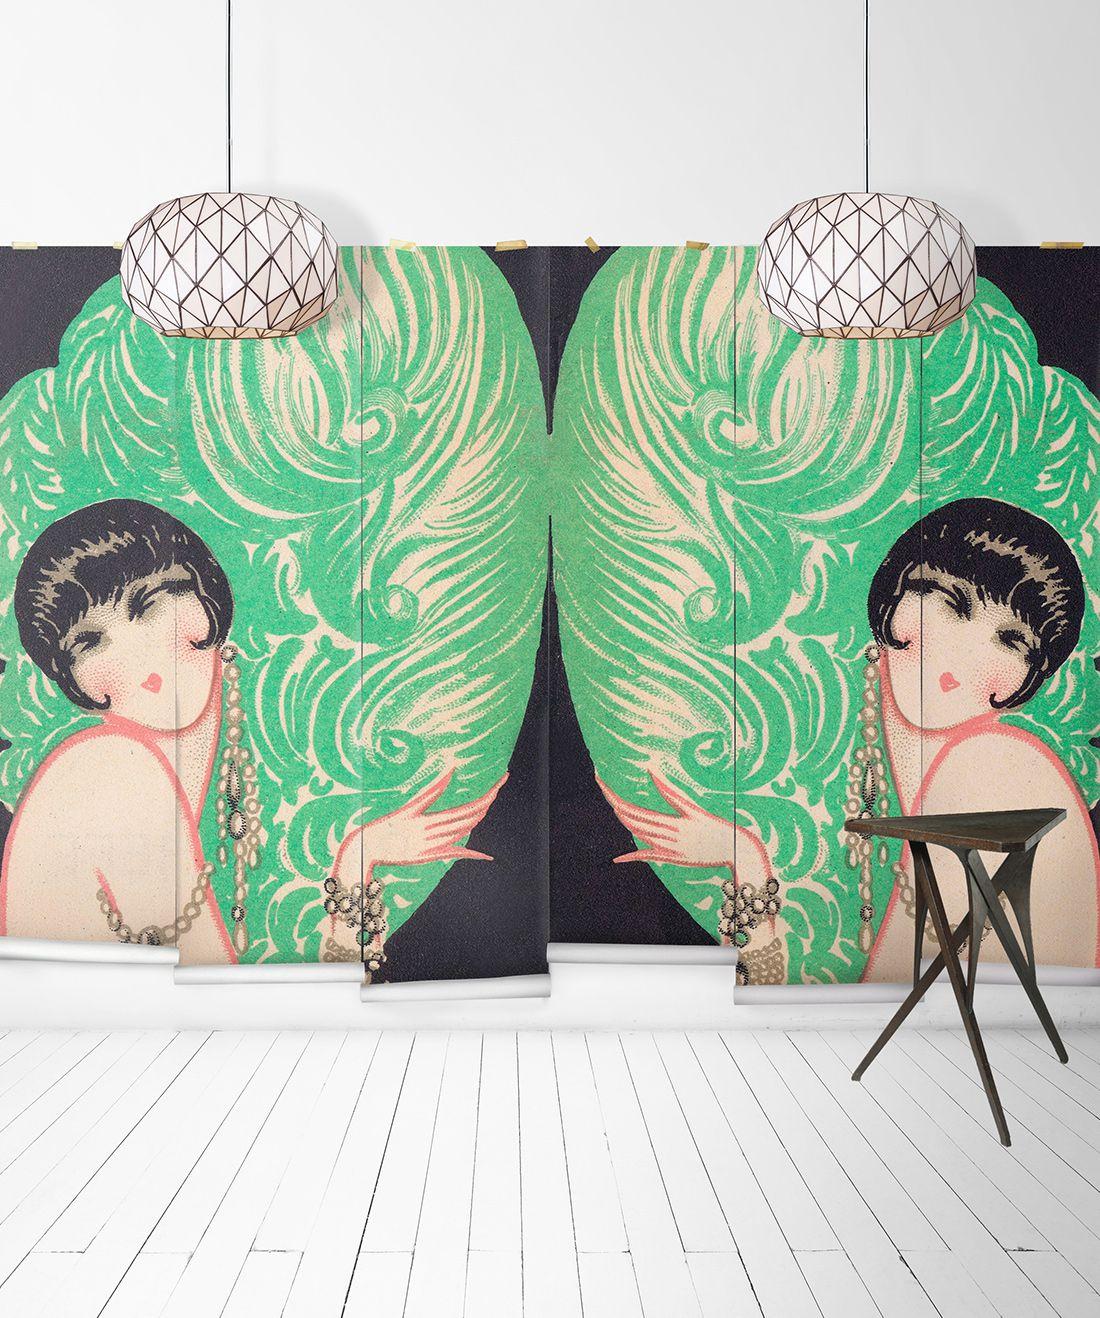 Mirrored Burlesque Mural